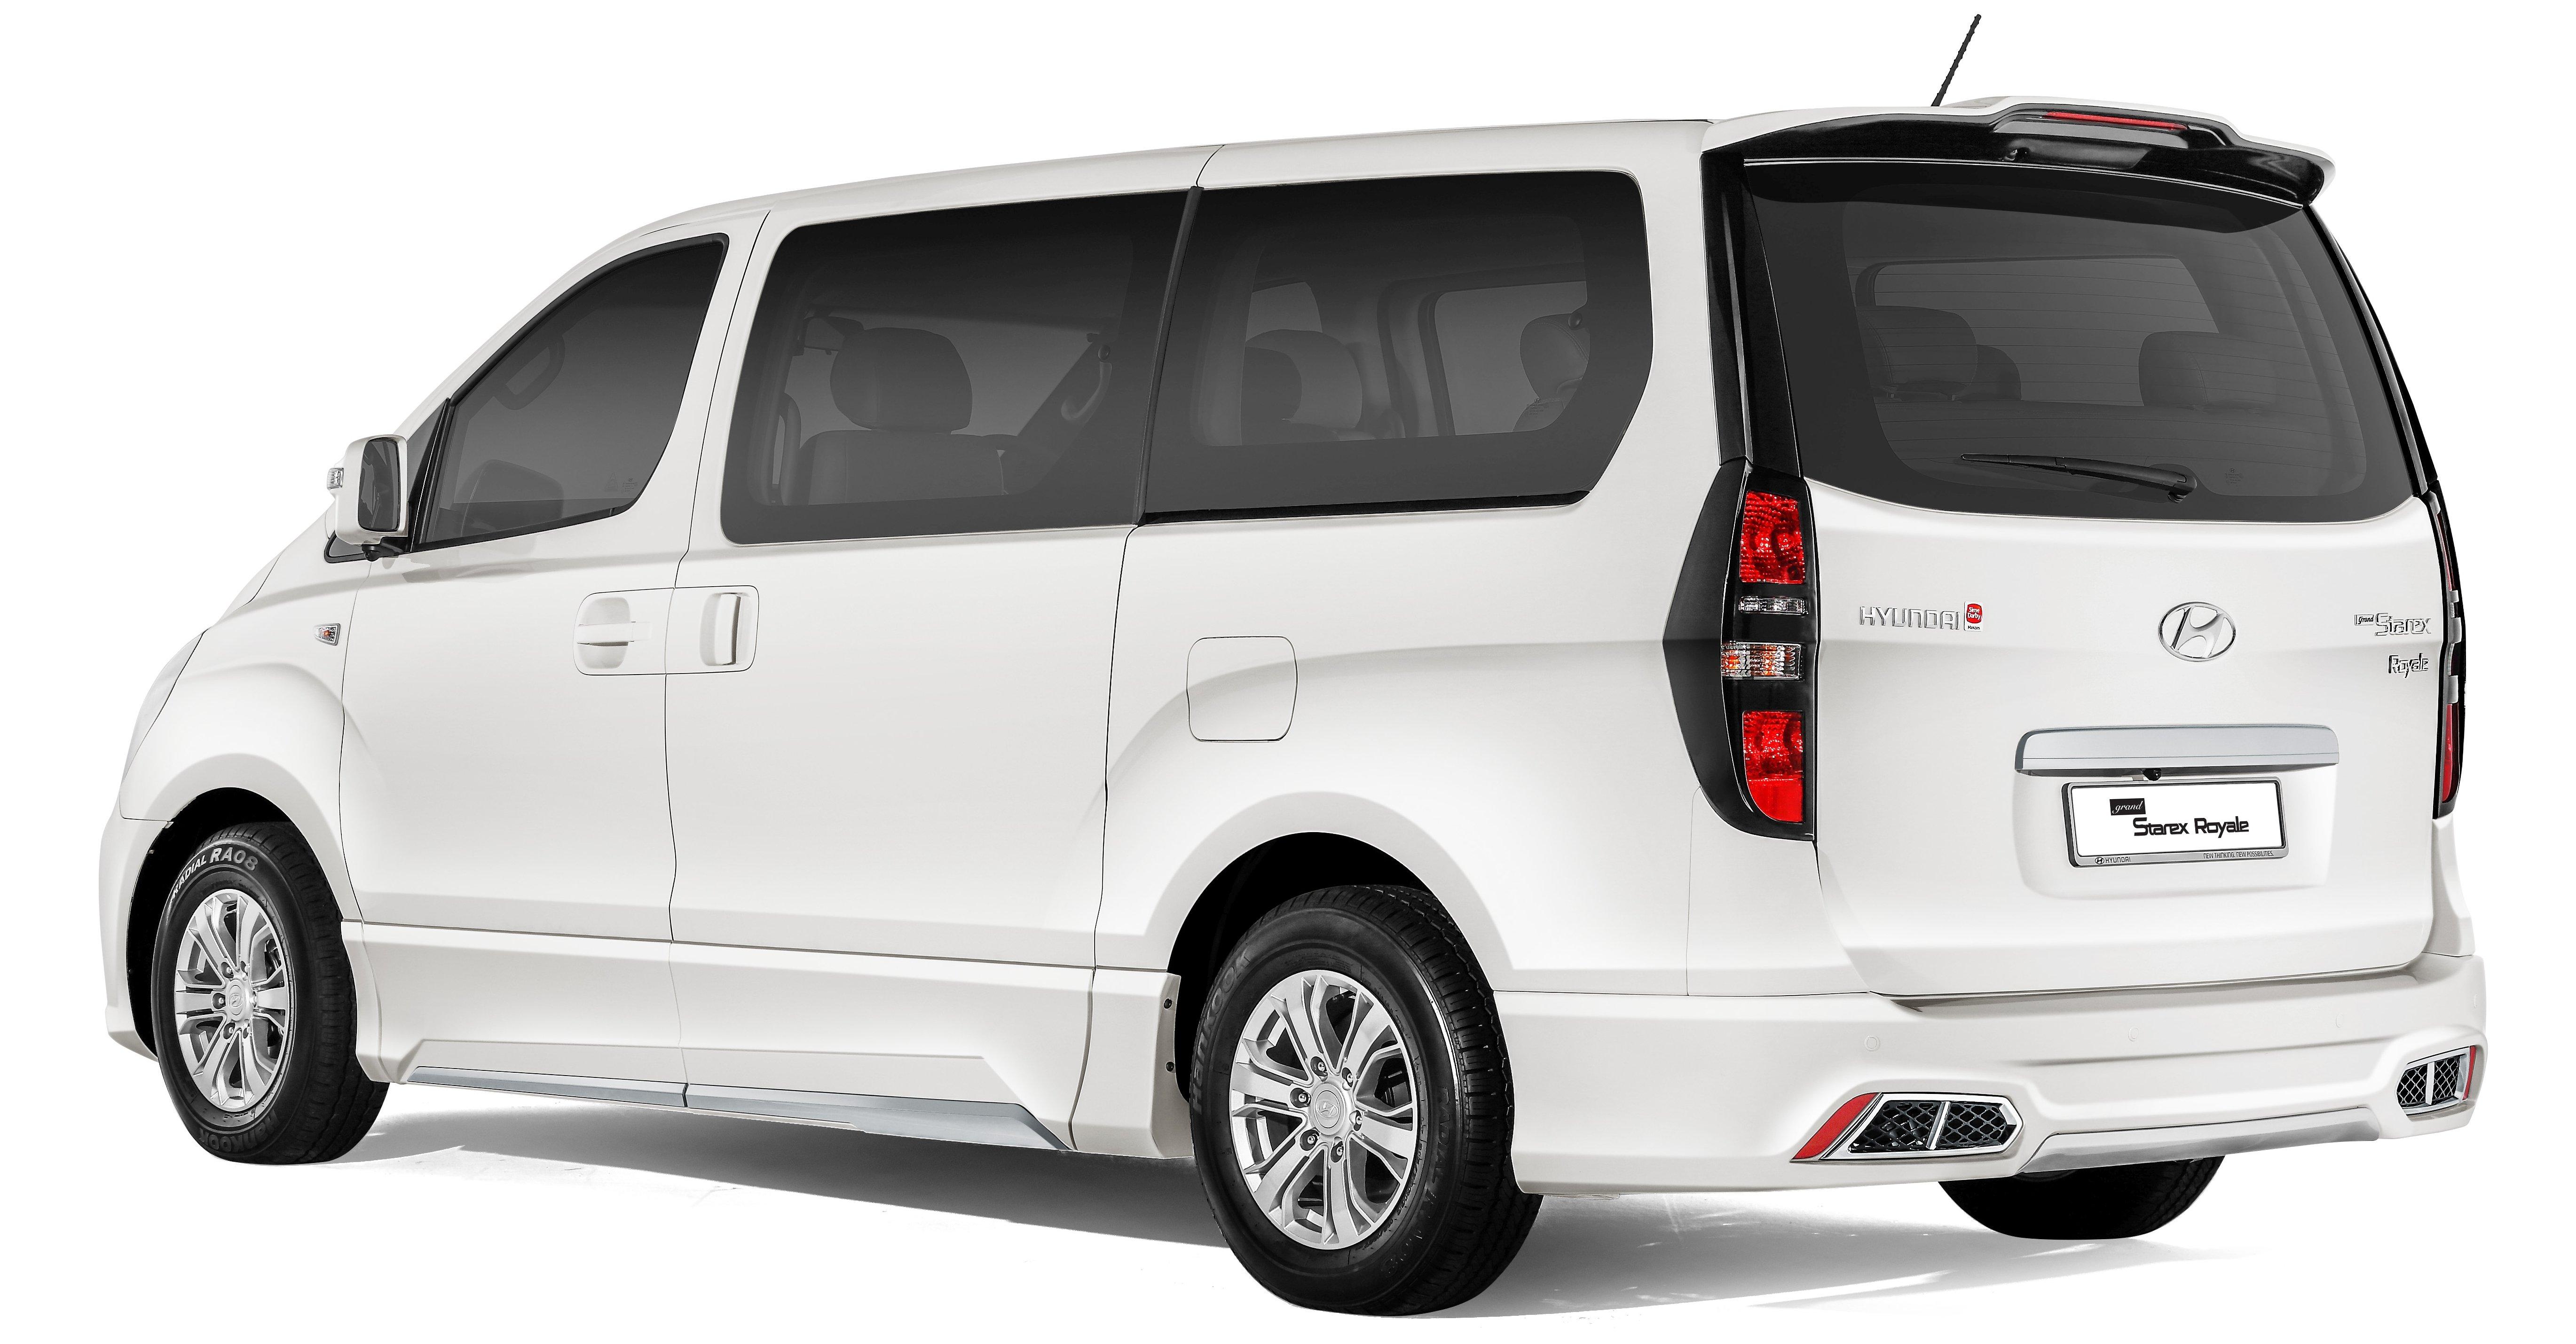 Hyundai Starex 2019 >> 2017 Hyundai Grand Starex Royale facelift – RM169k Paul Tan - Image 583783